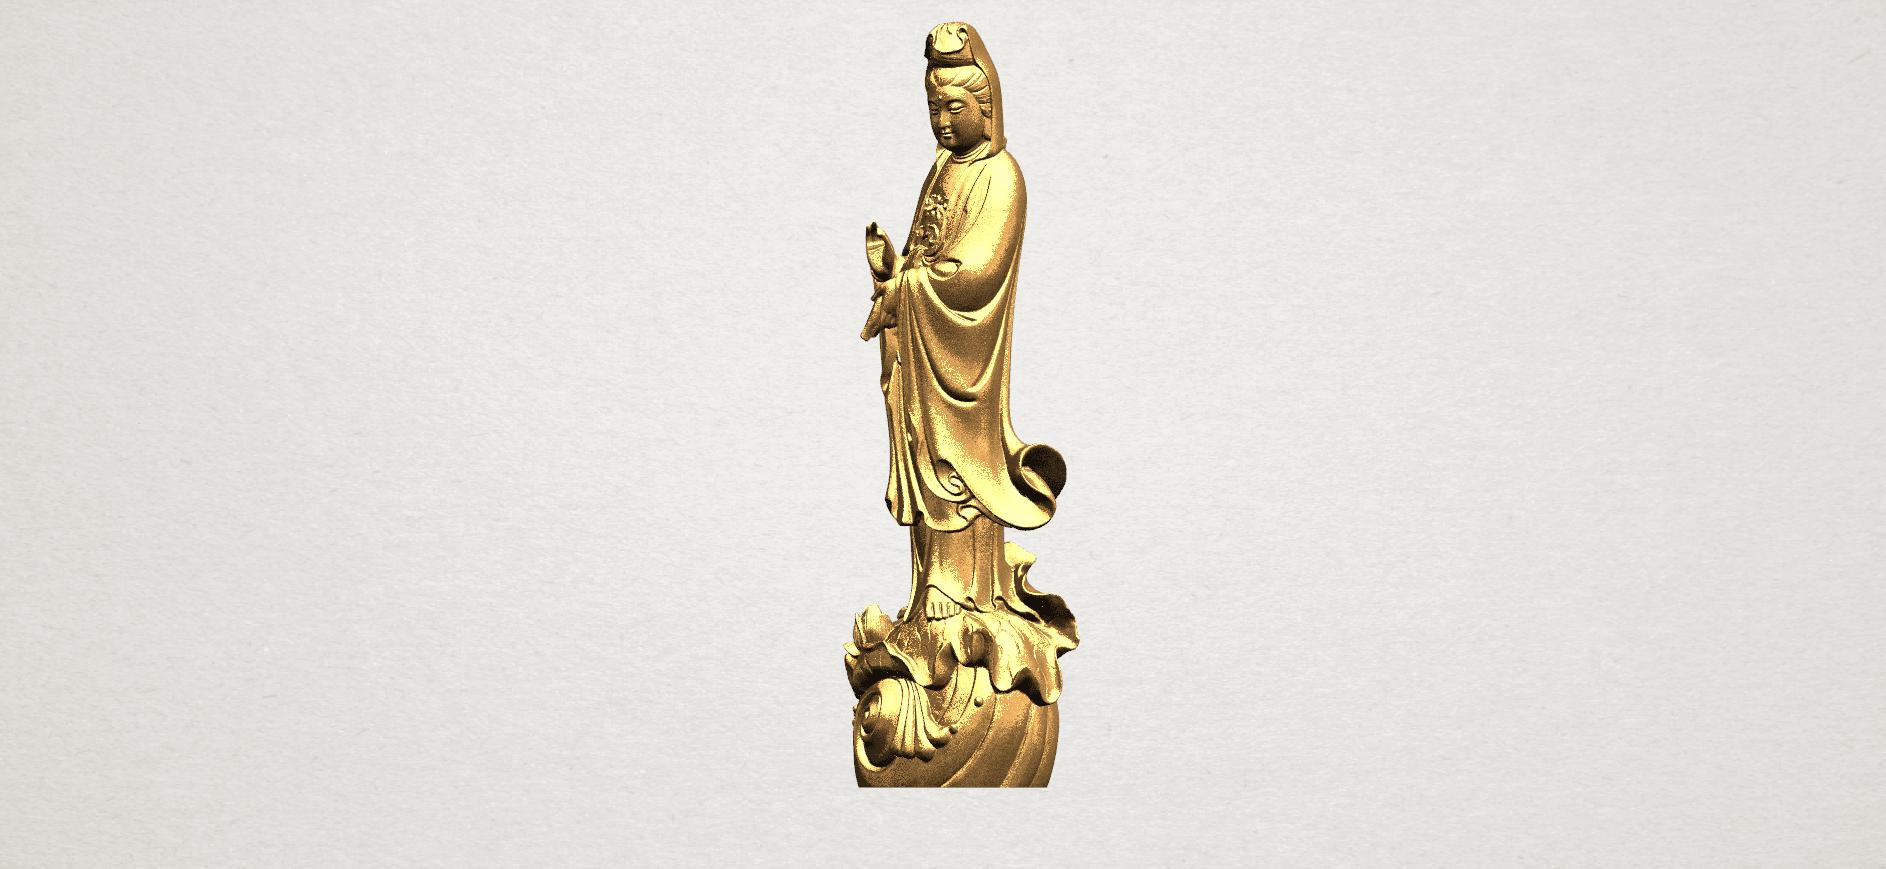 Avalokitesvara Buddha - Standing (i) A02.png Télécharger fichier STL gratuit Avalokitesvara Bodhisattva - Debout 01 • Design à imprimer en 3D, GeorgesNikkei